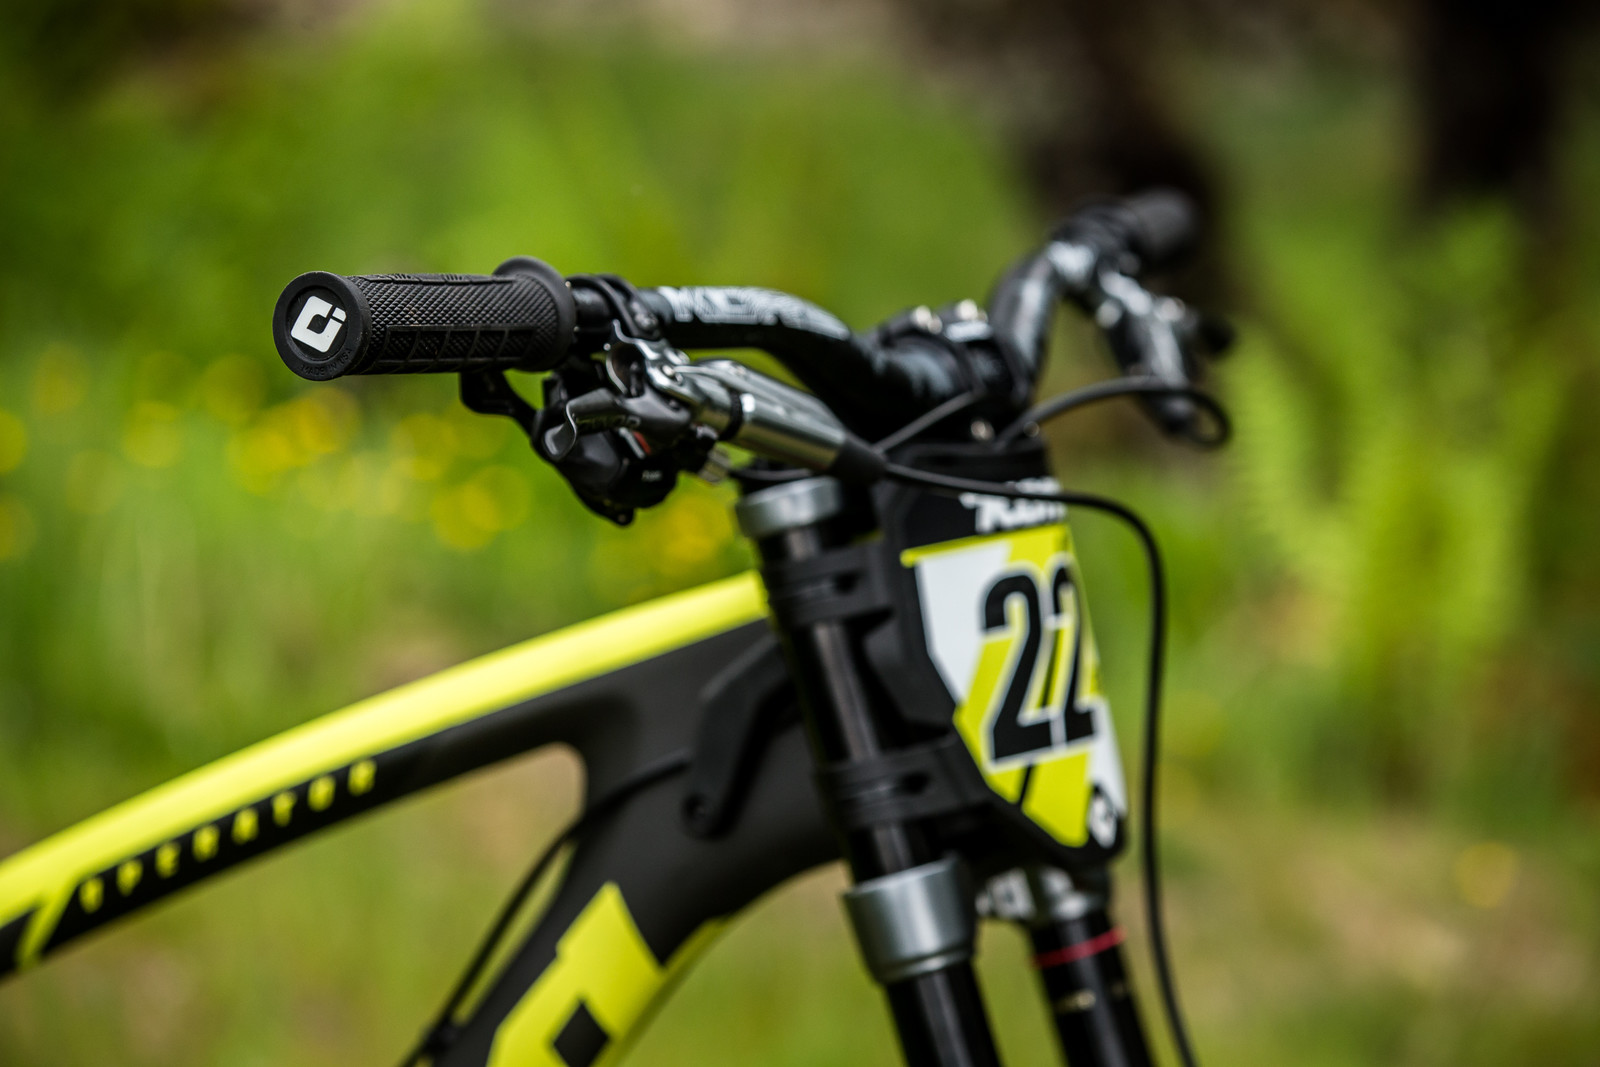 ODI Grips - Connor Fearon's Kona Supreme Operator for Fort William - Mountain Biking Pictures - Vital MTB